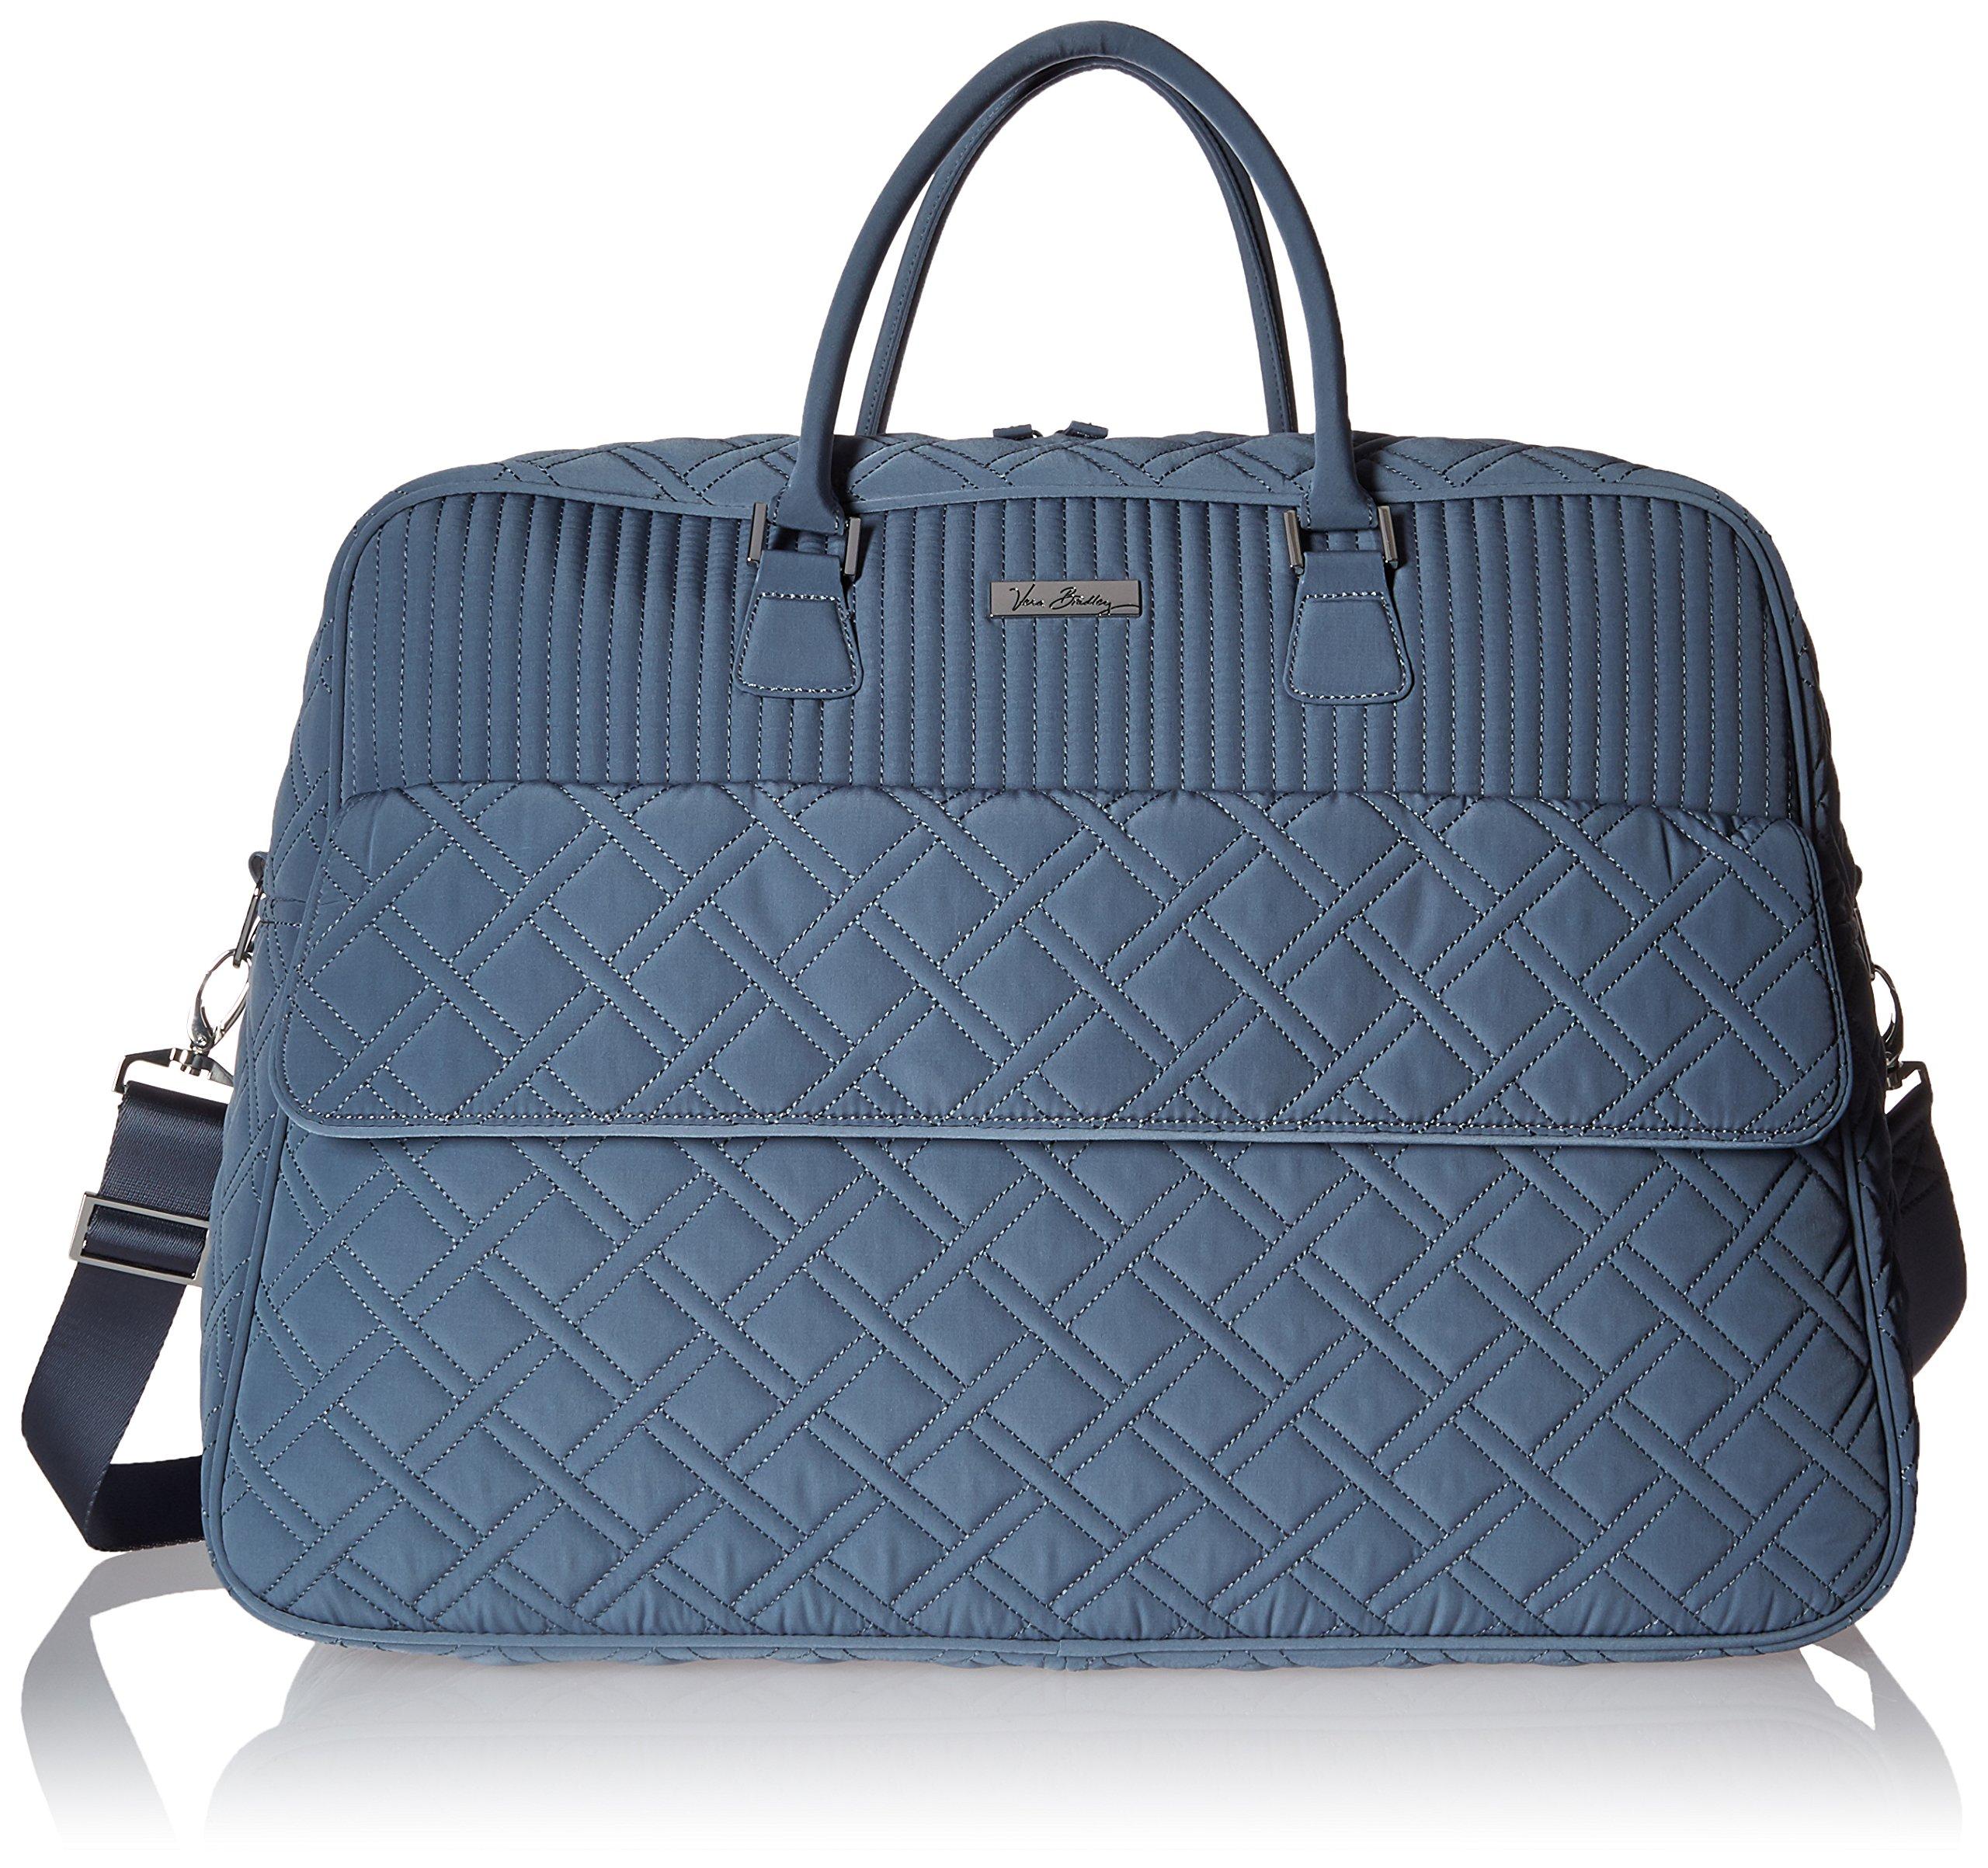 Vera Bradley Luggage Women's Grand Traveler, Charcoal